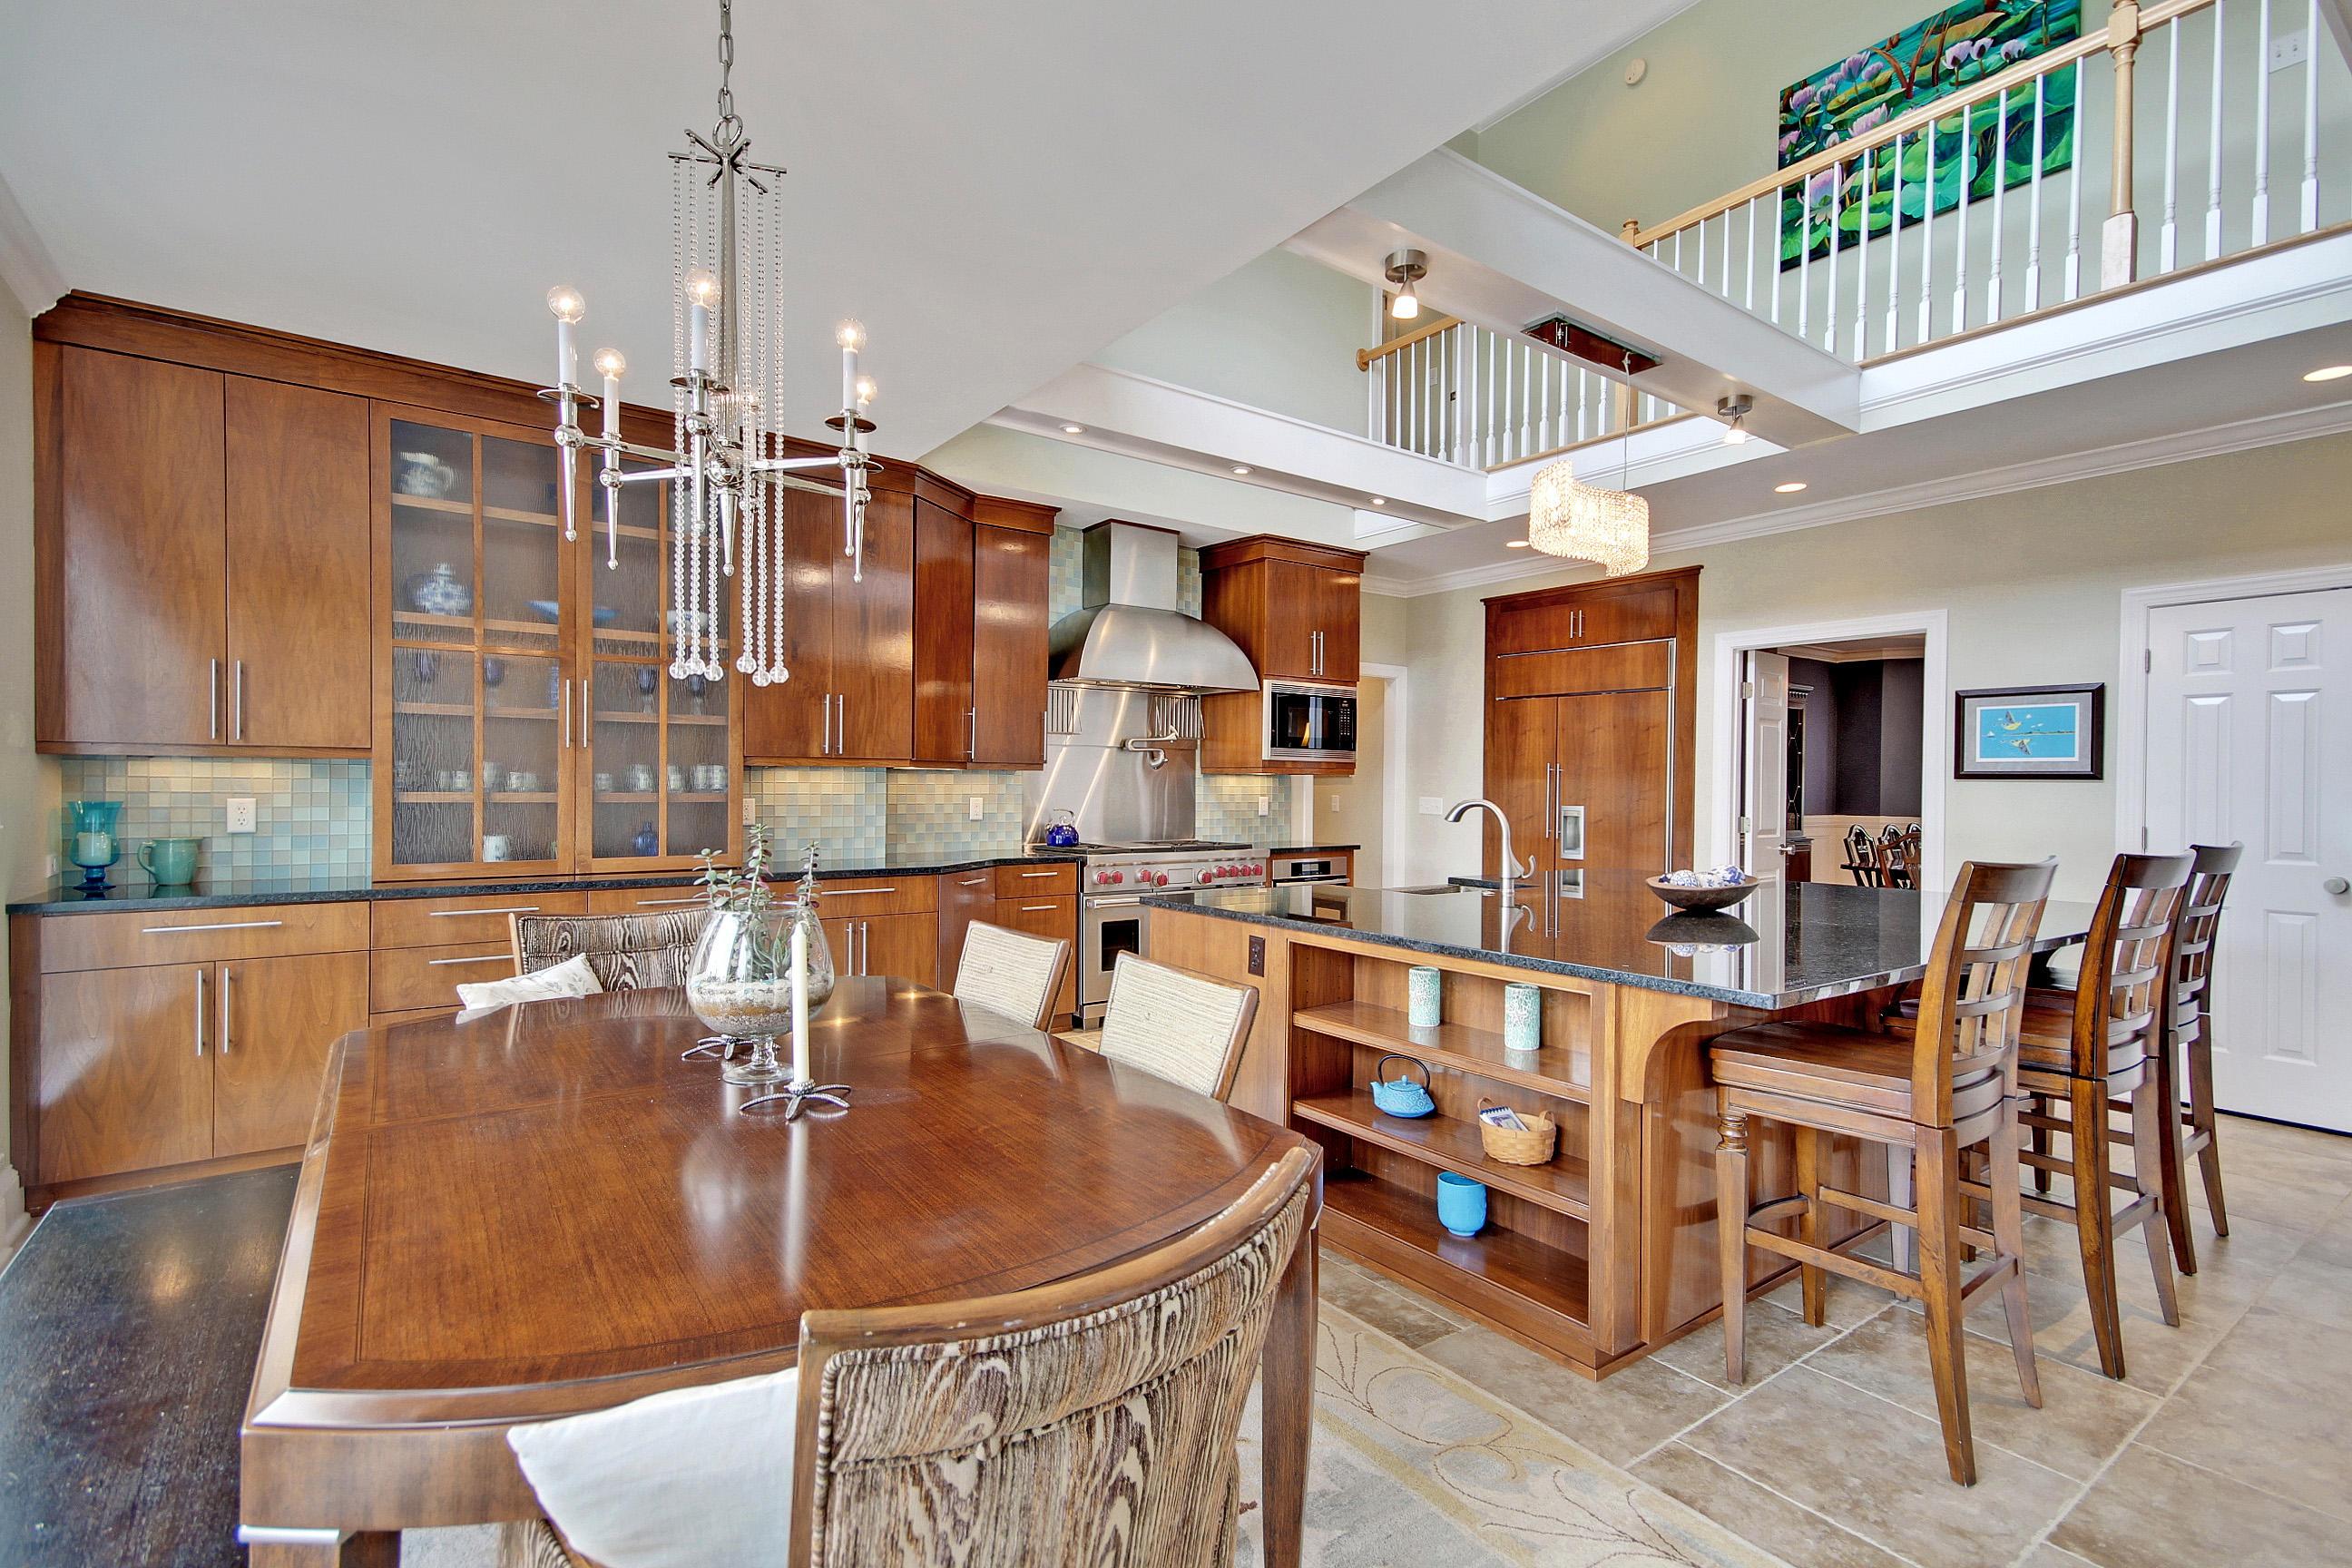 Dunes West Homes For Sale - 2364 Darts Cove, Mount Pleasant, SC - 55